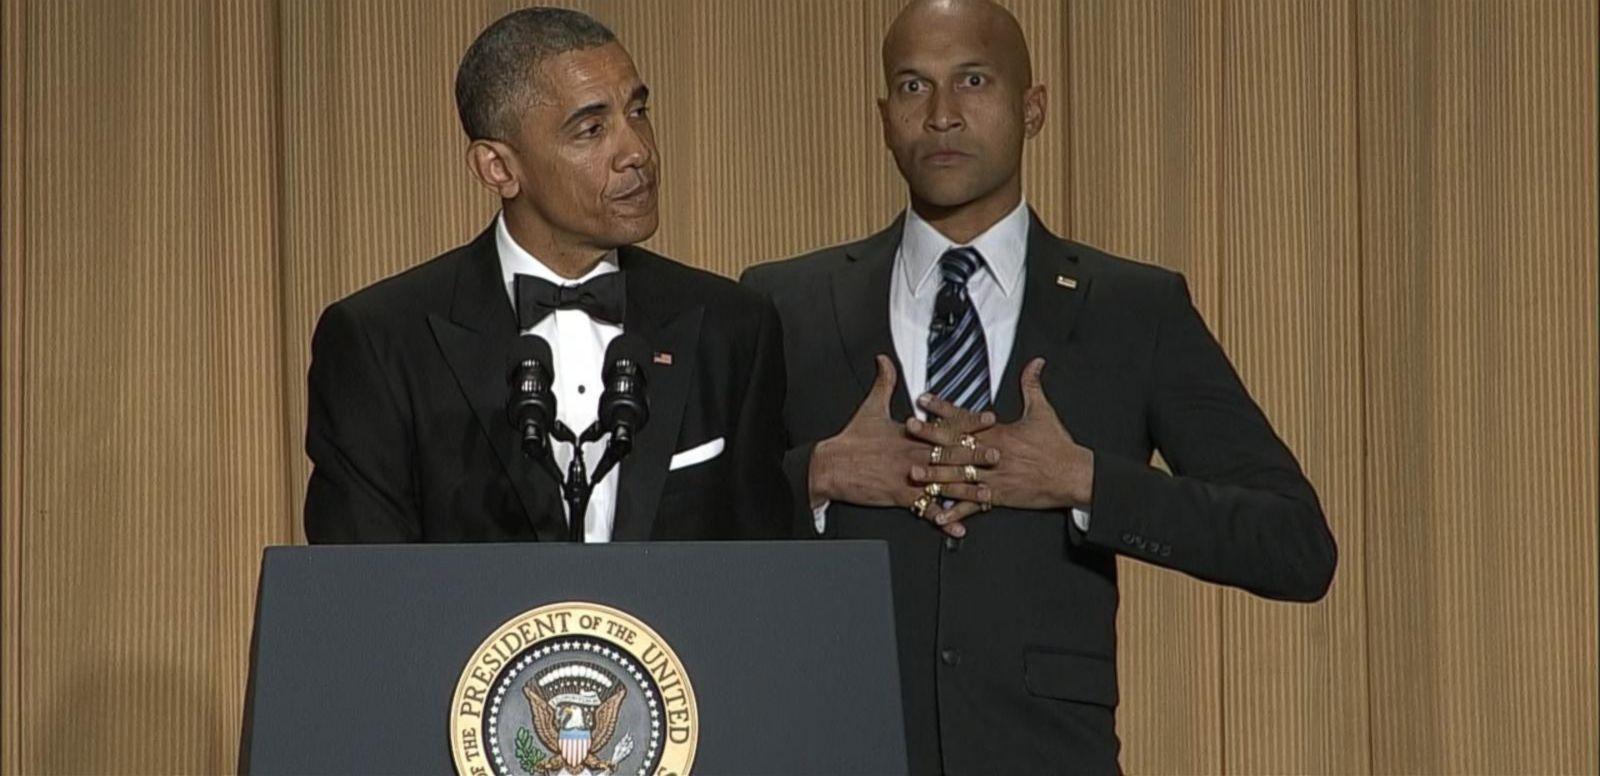 VIDEO: Obama's Anger Management Translator Speaks the Truth